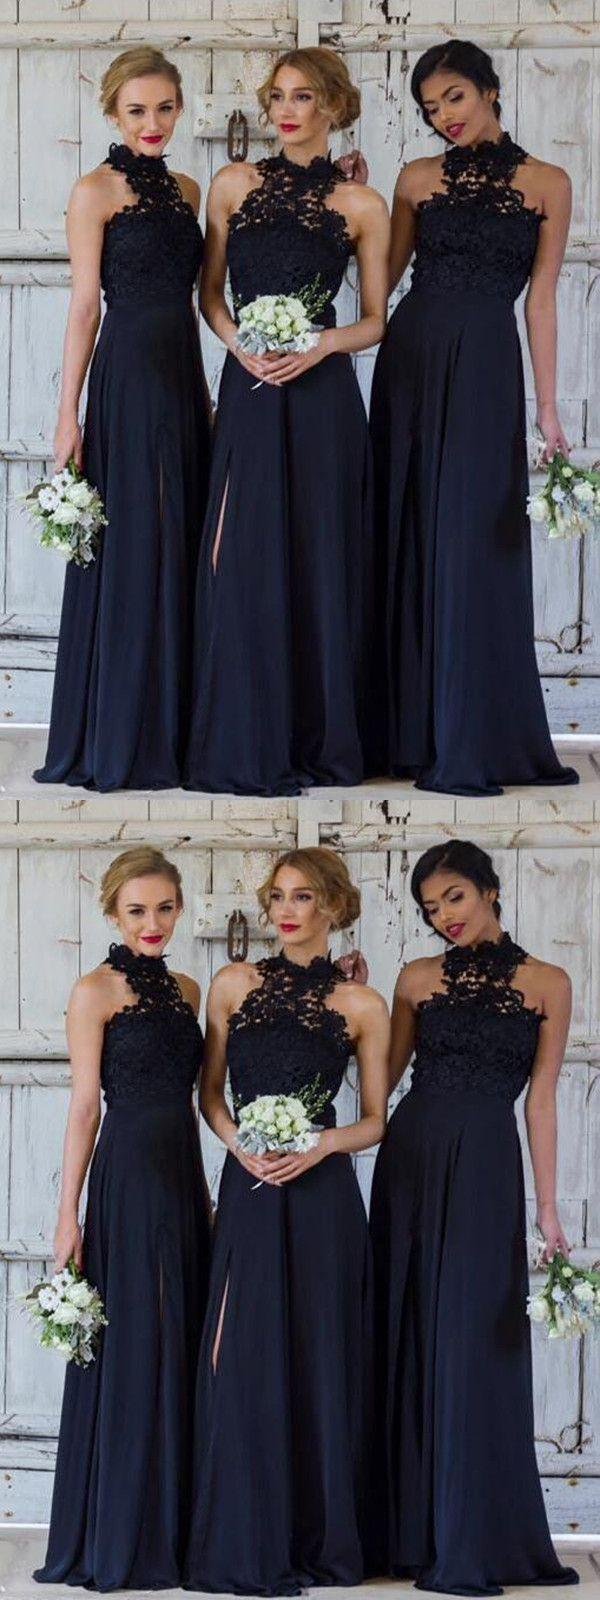 Wedding - Chic Lace Bridesmaid Dresses Chiffon Cheap Bridesmaid Dresses # VB2404